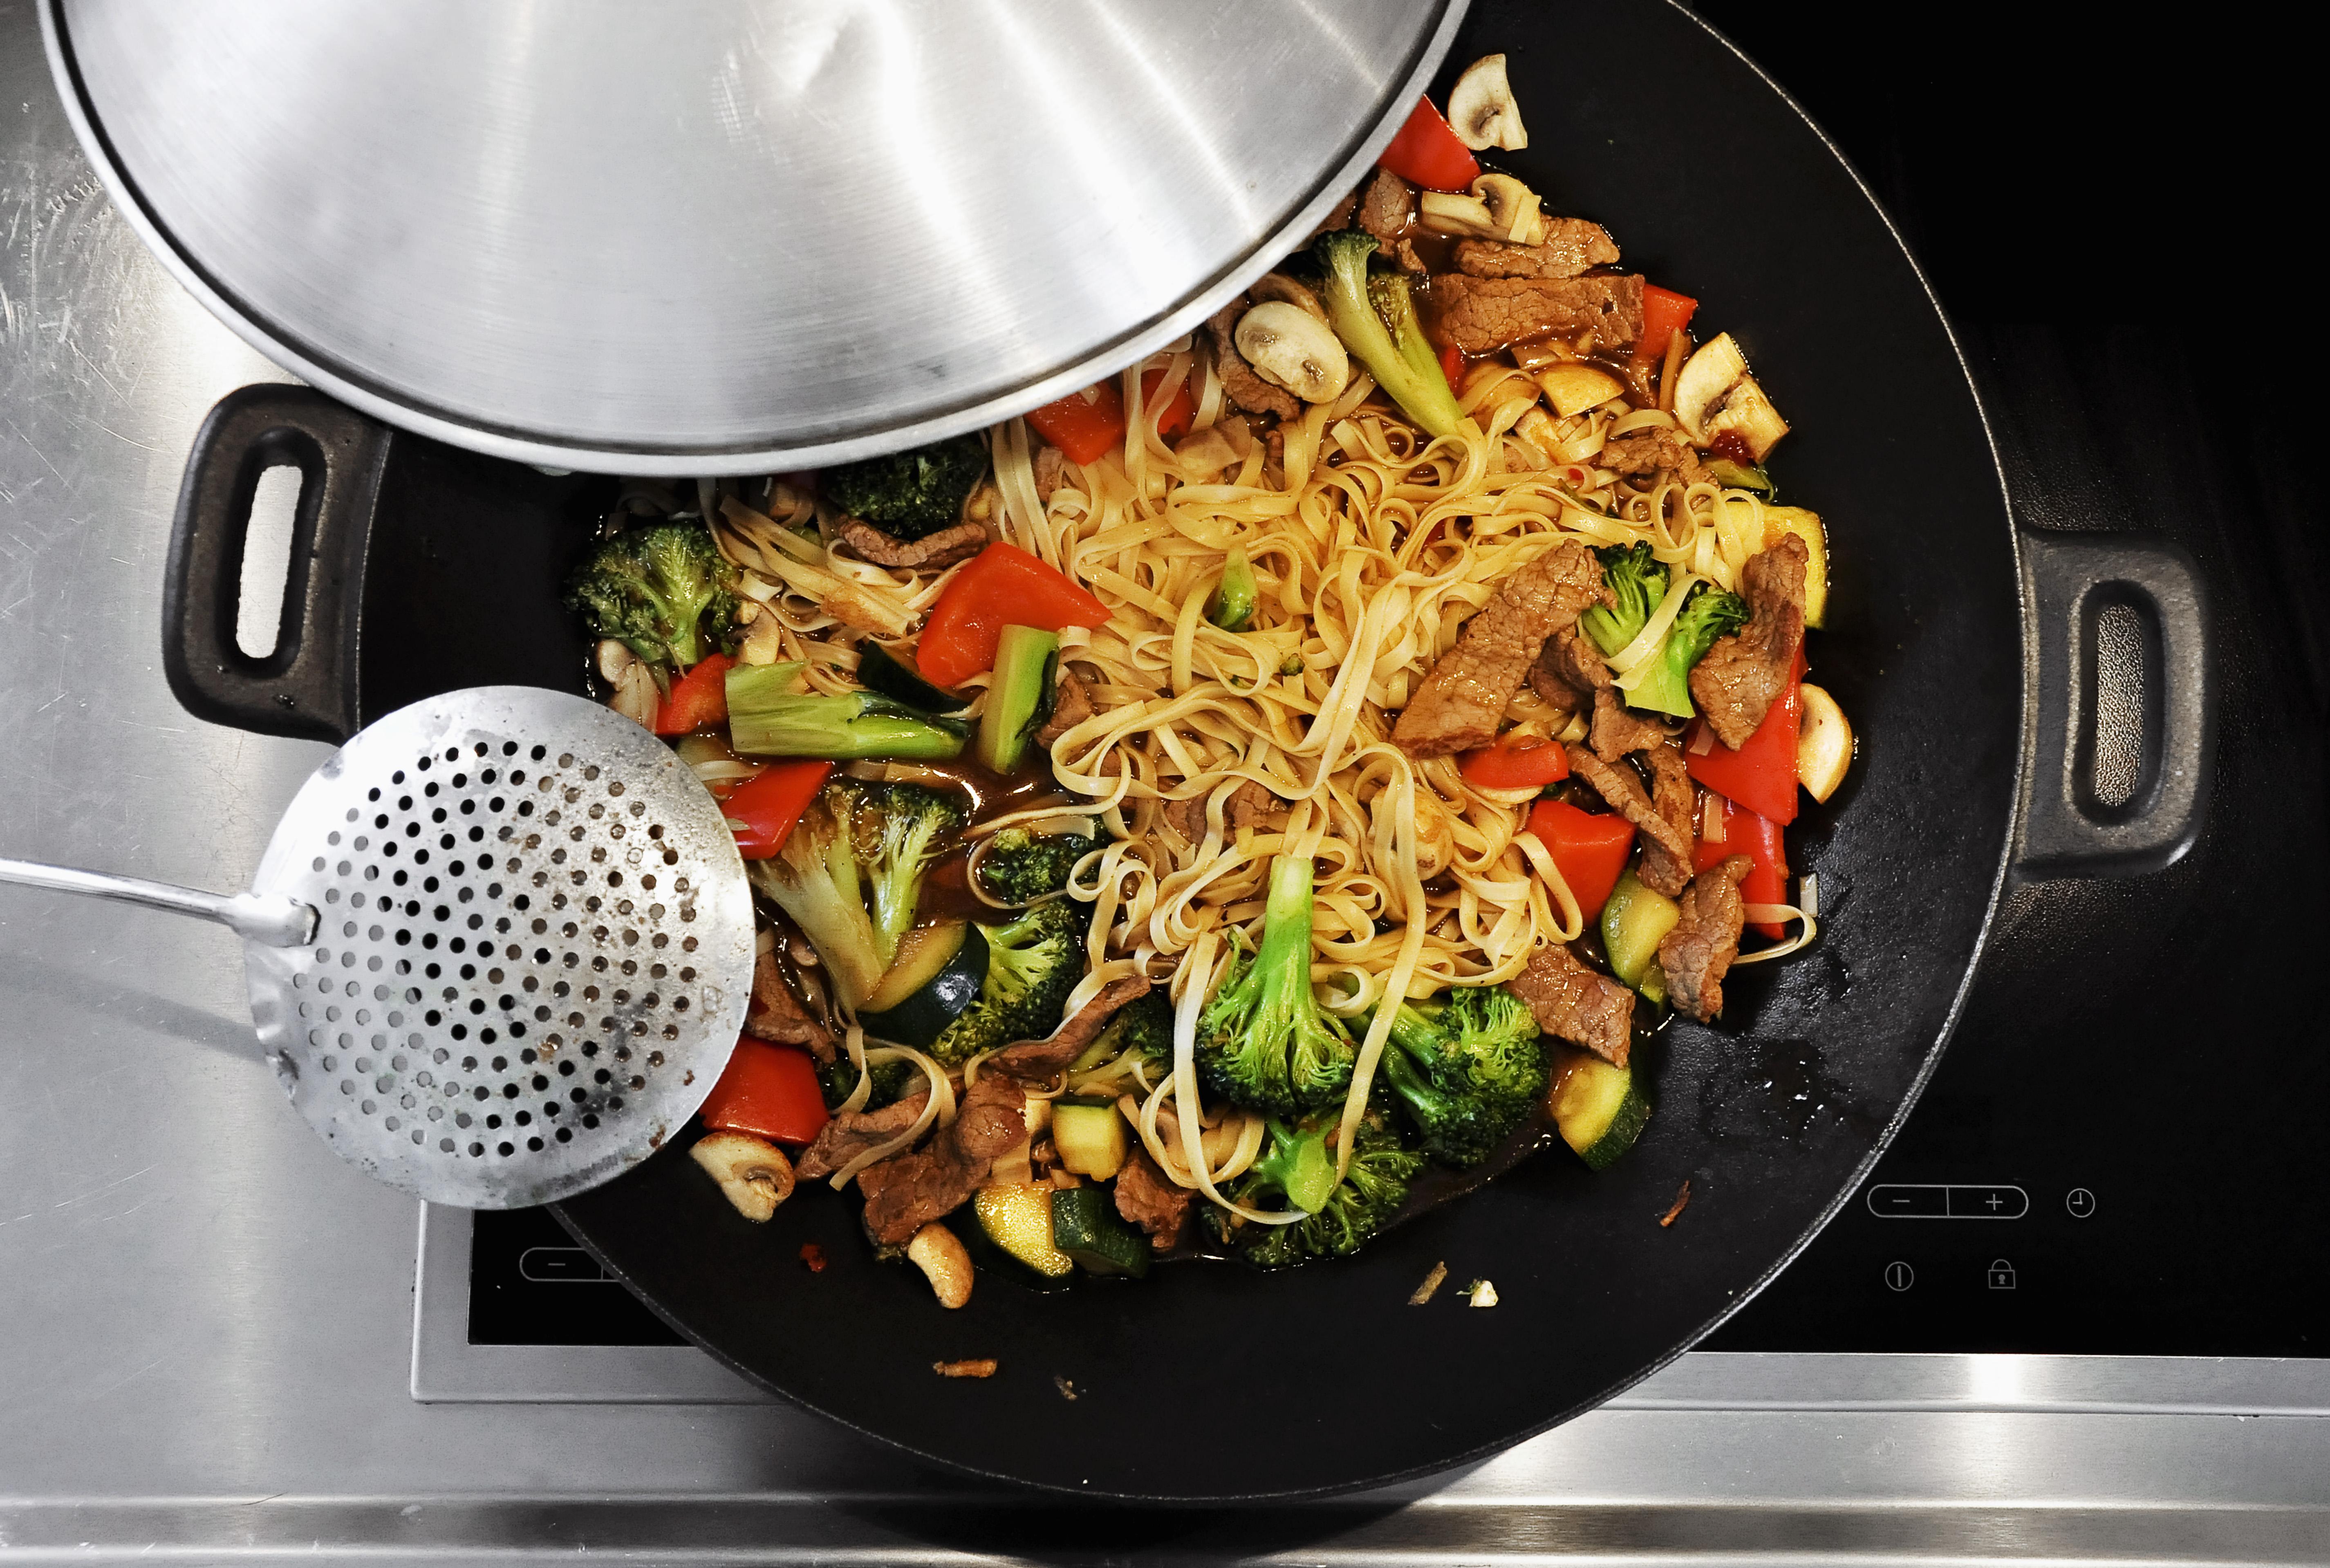 Cooking vegetable stir-fry in a wok